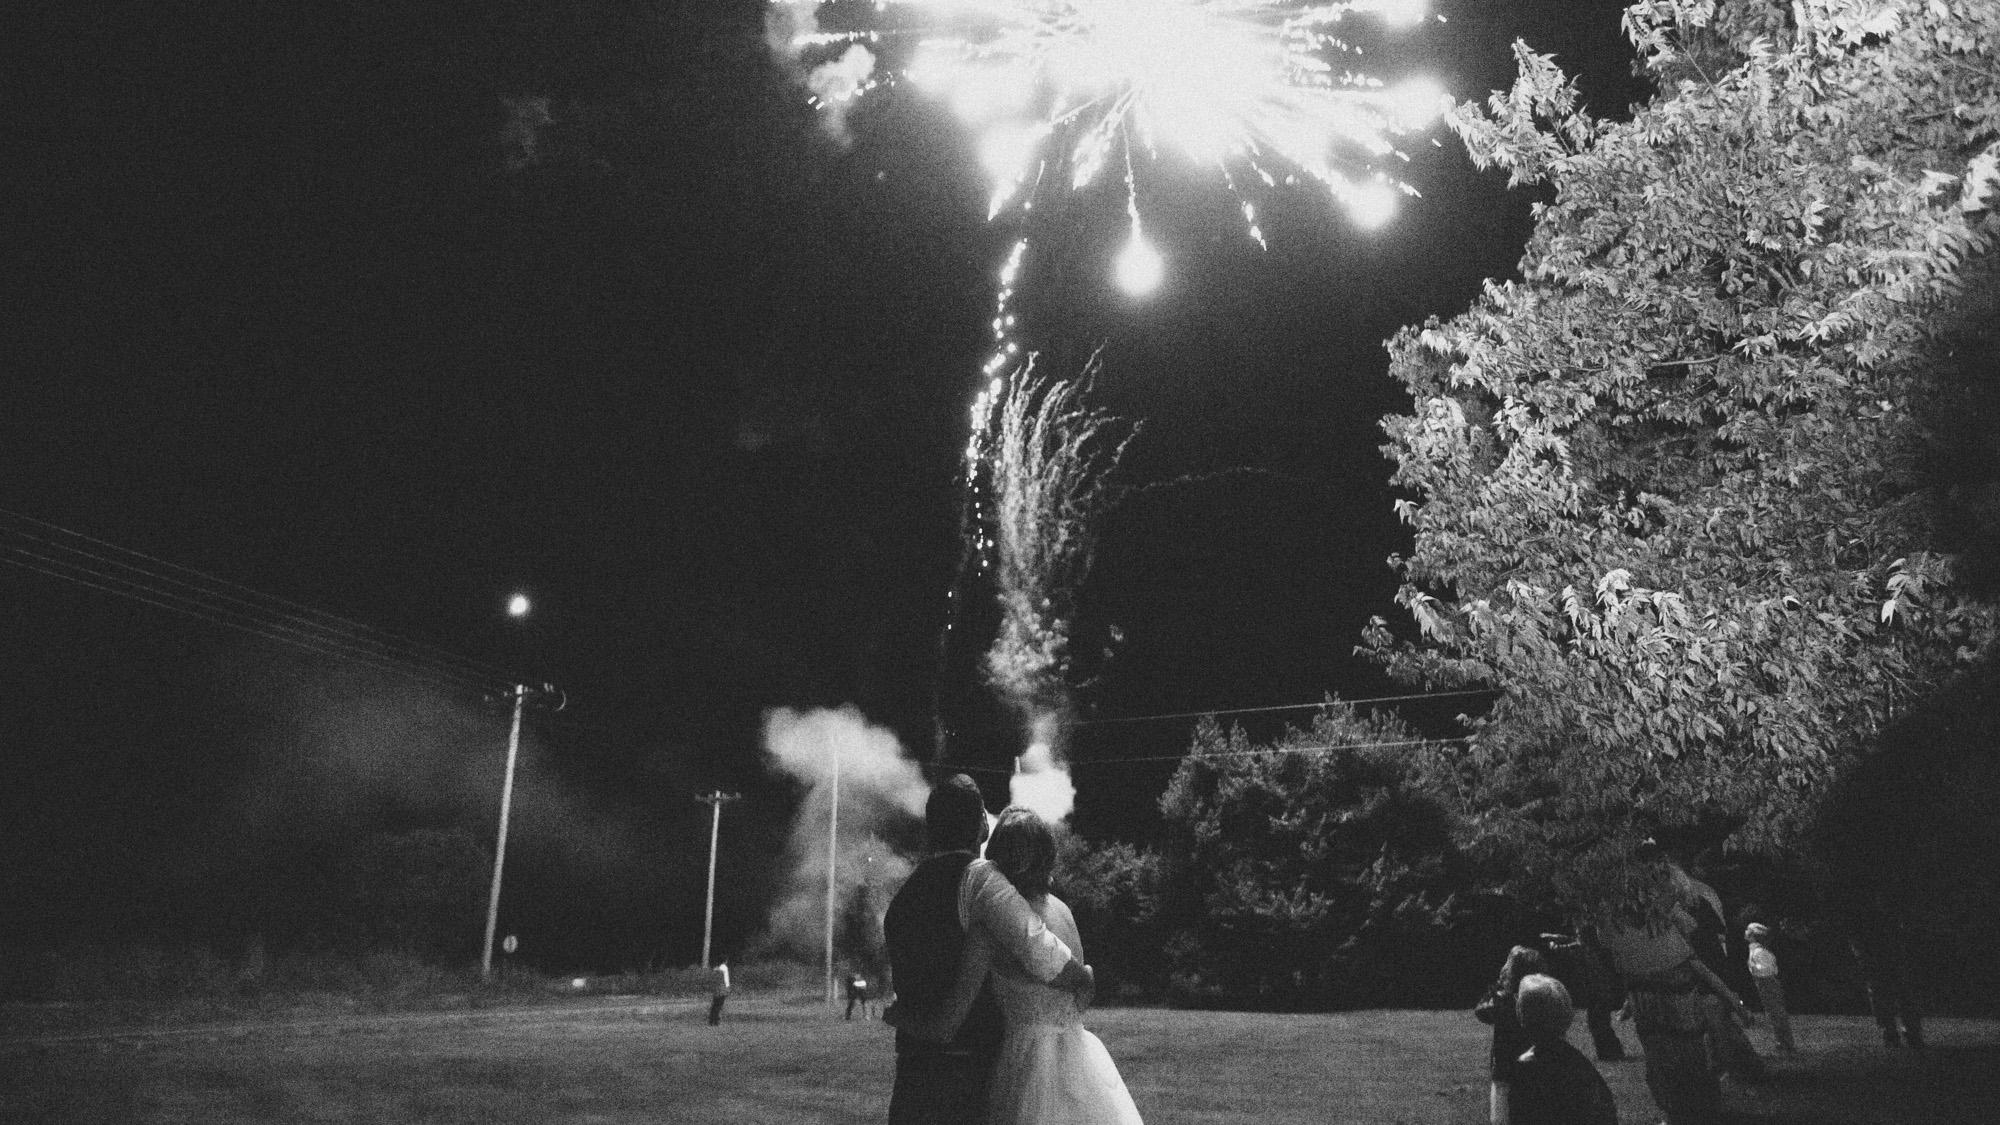 alec_vanderboom_springfield_missouri_wedding-0088.jpg